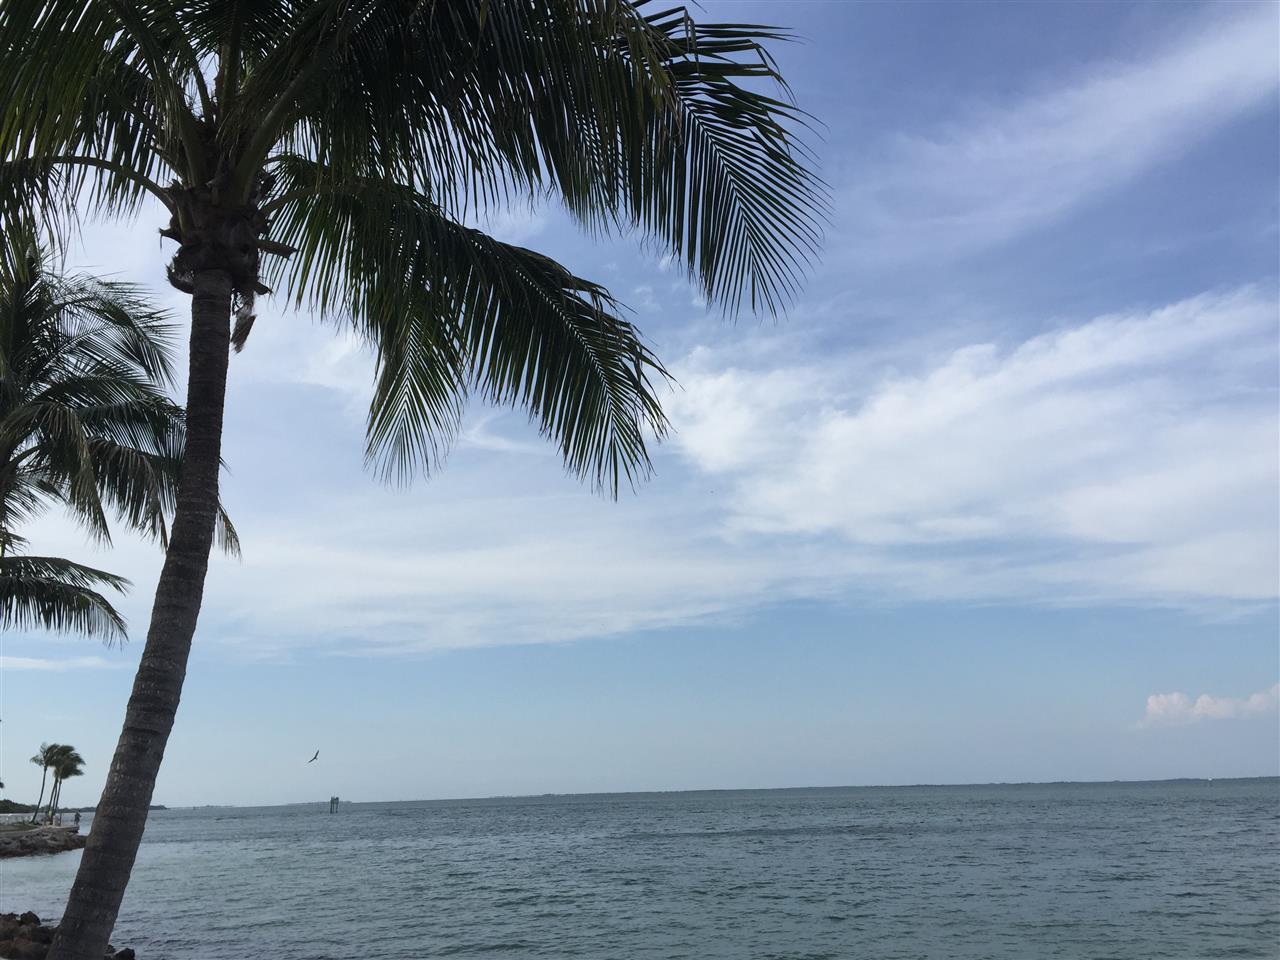 #Sanibel/Captiva  the drive to the Southseas Resort